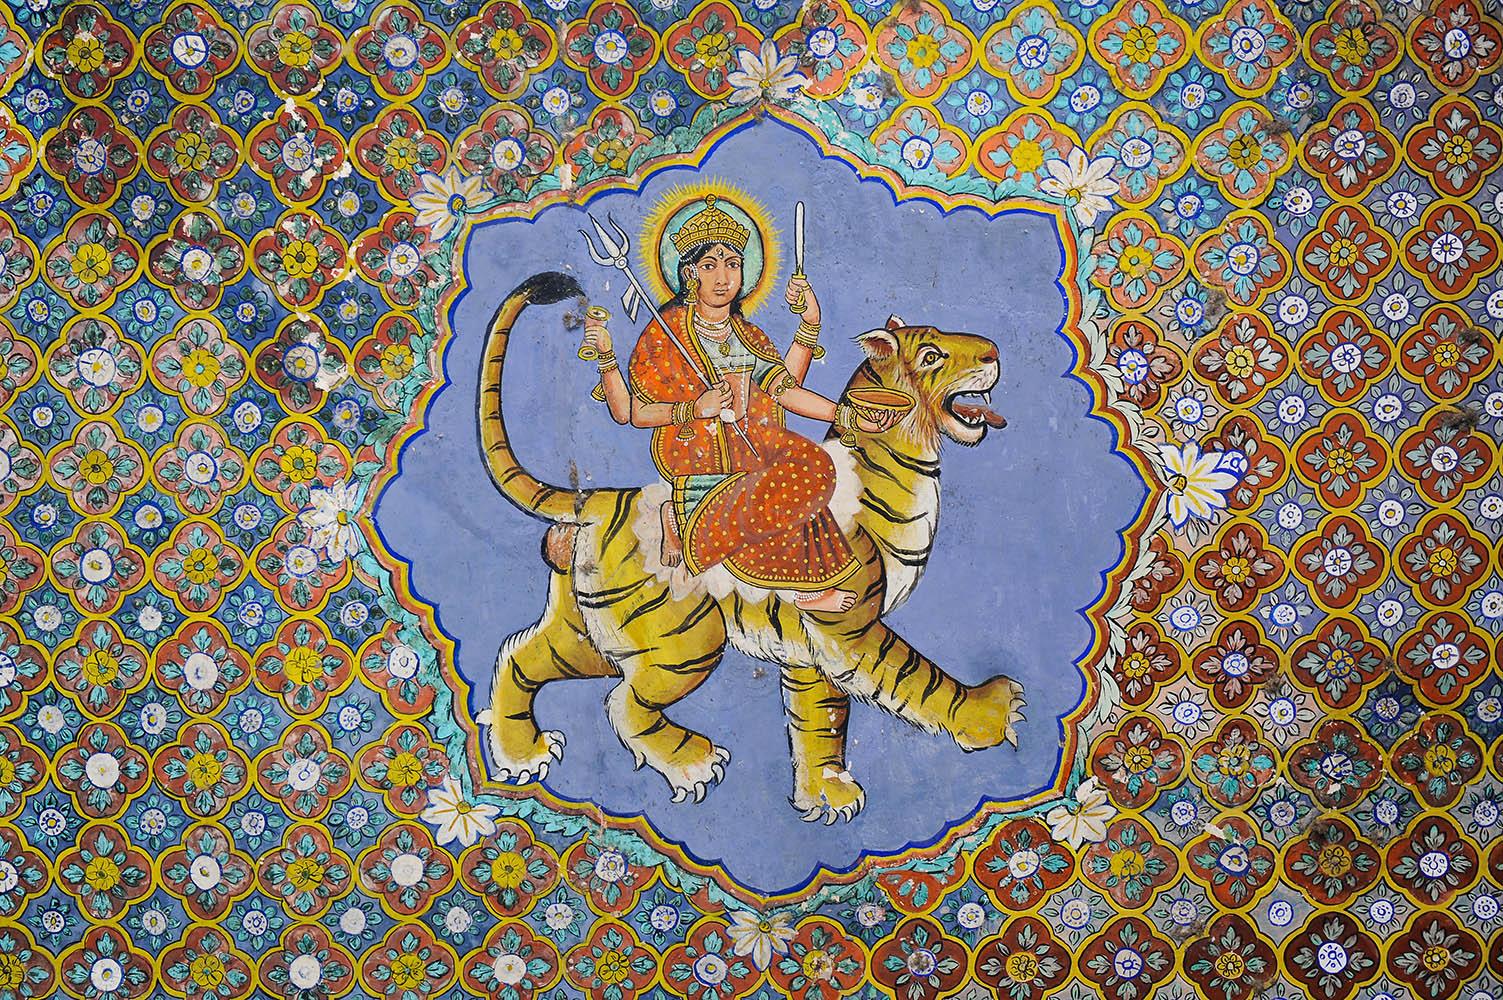 Hindu goddess Durga riding a tiger, Kota, Rajasthan, c.1800.